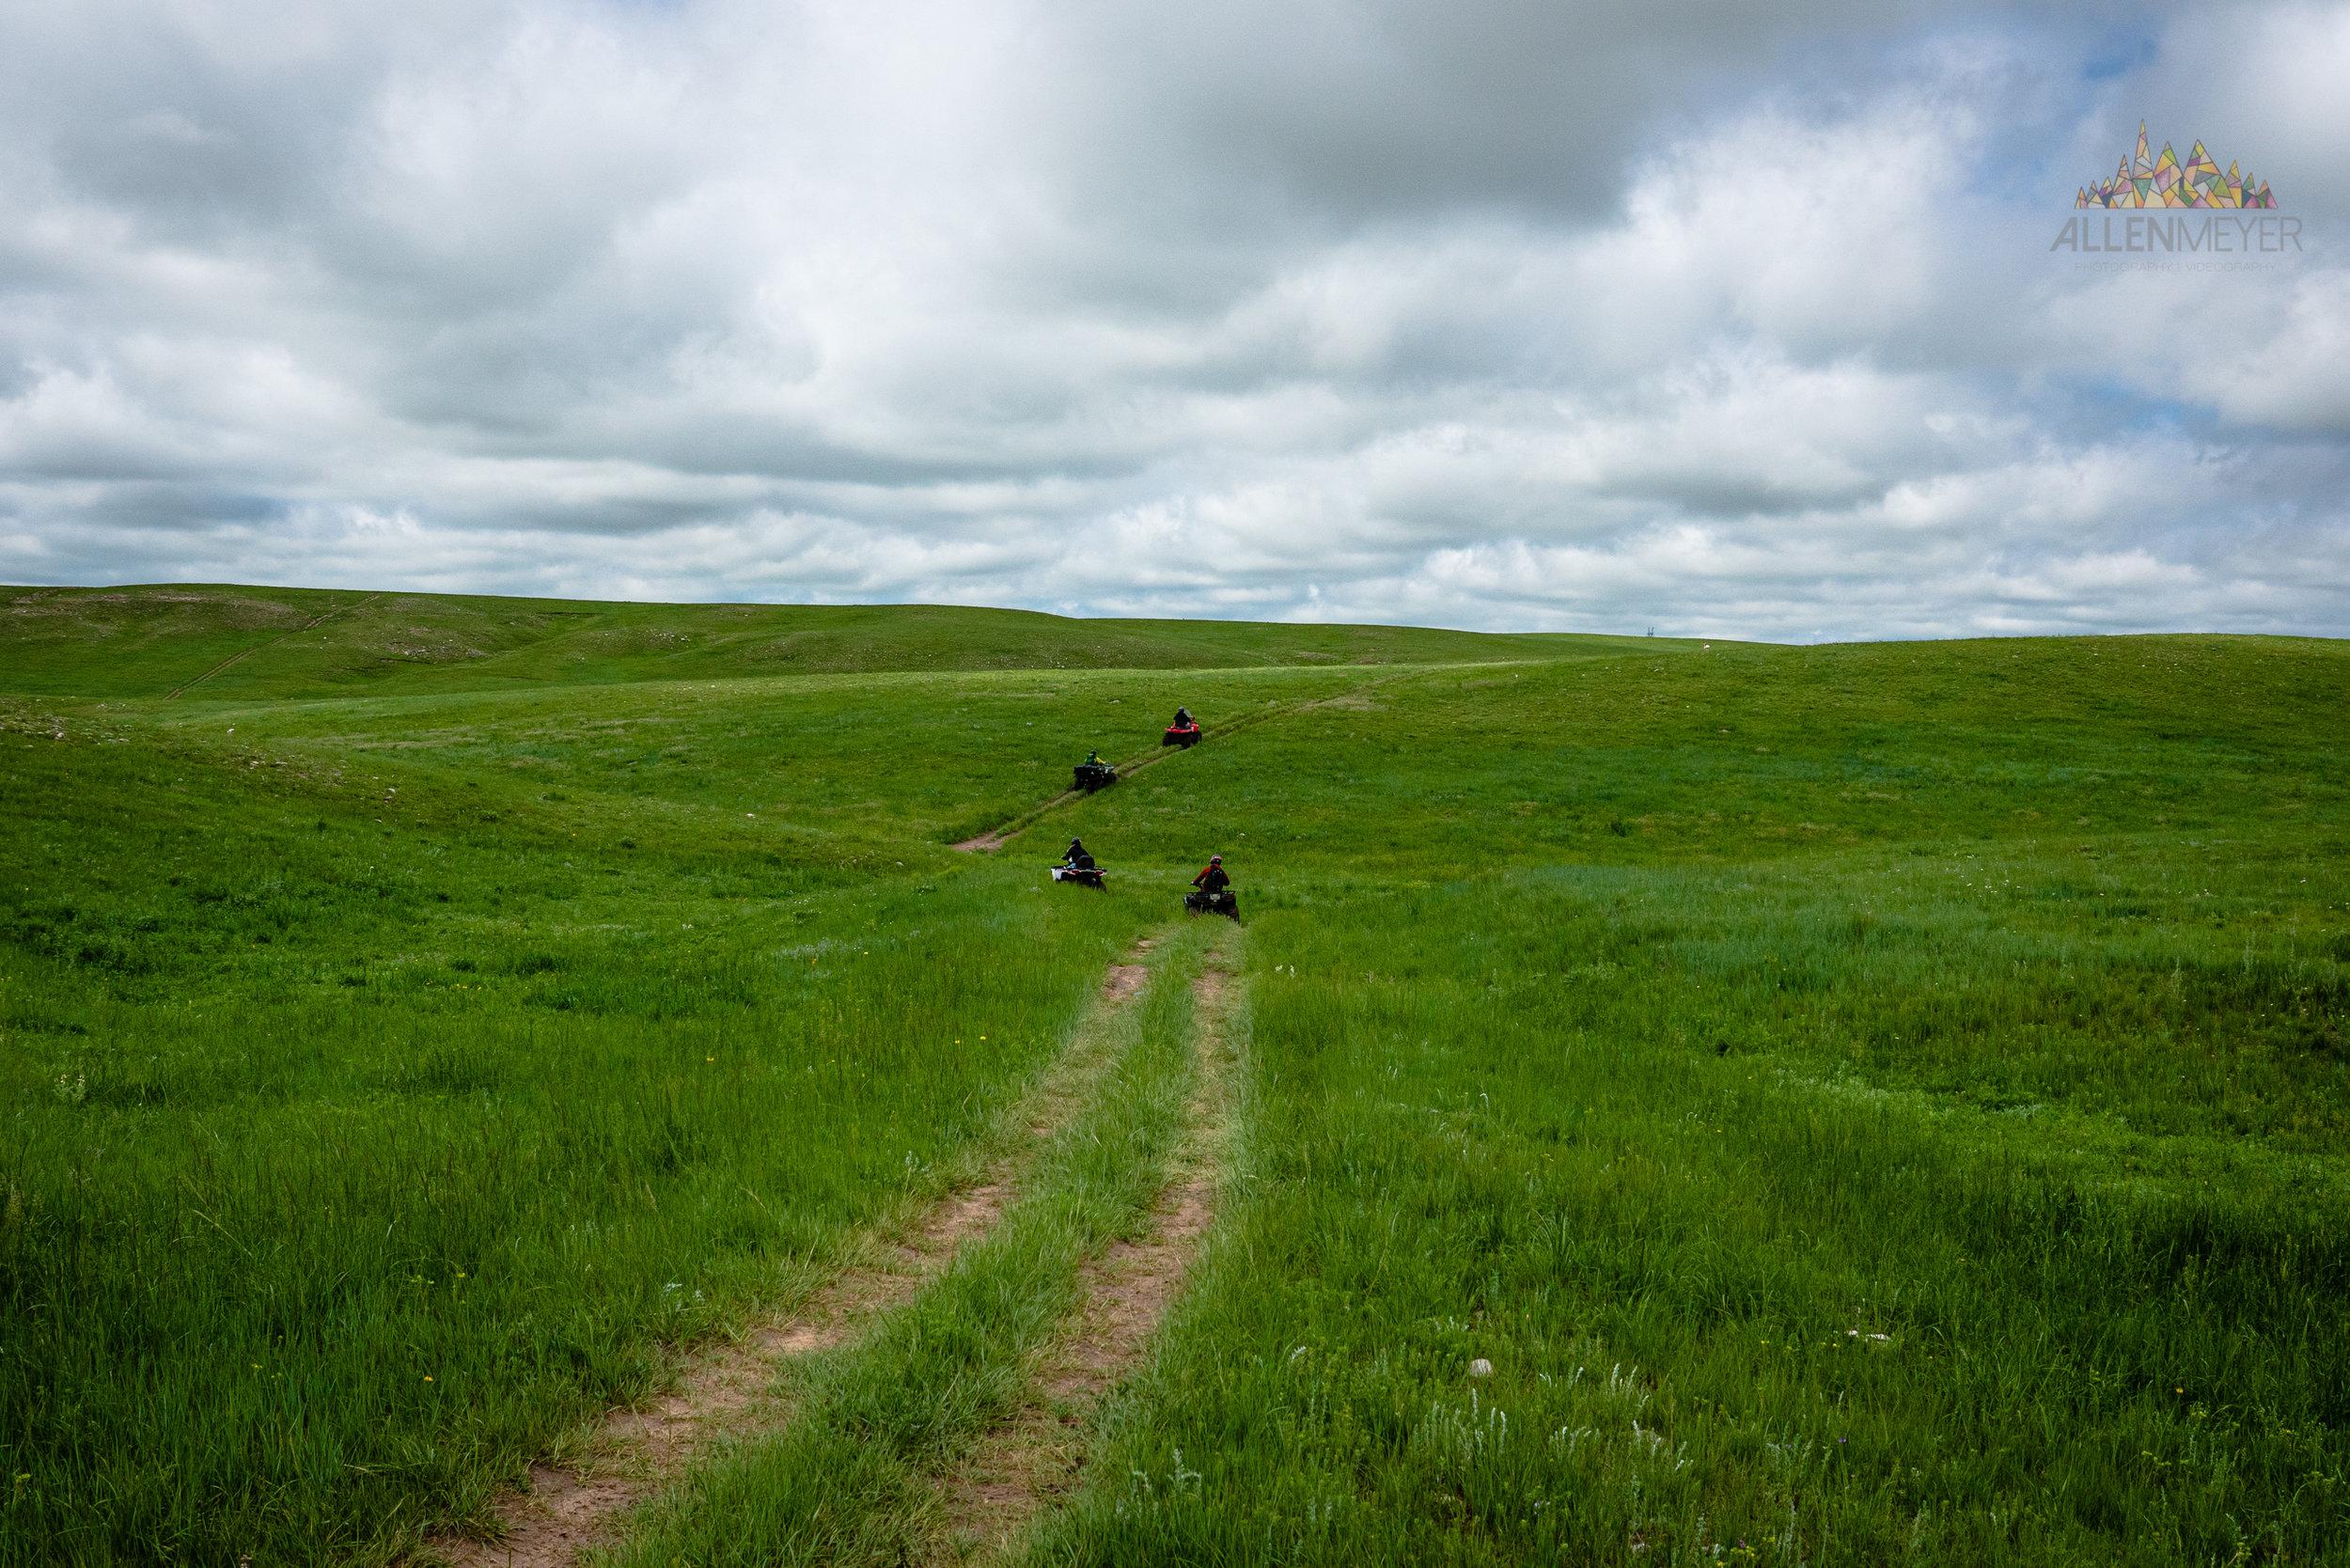 Outdoor Adventures In Cheyenne, Wyoming; Photography by Allen Meyer-03647.jpg